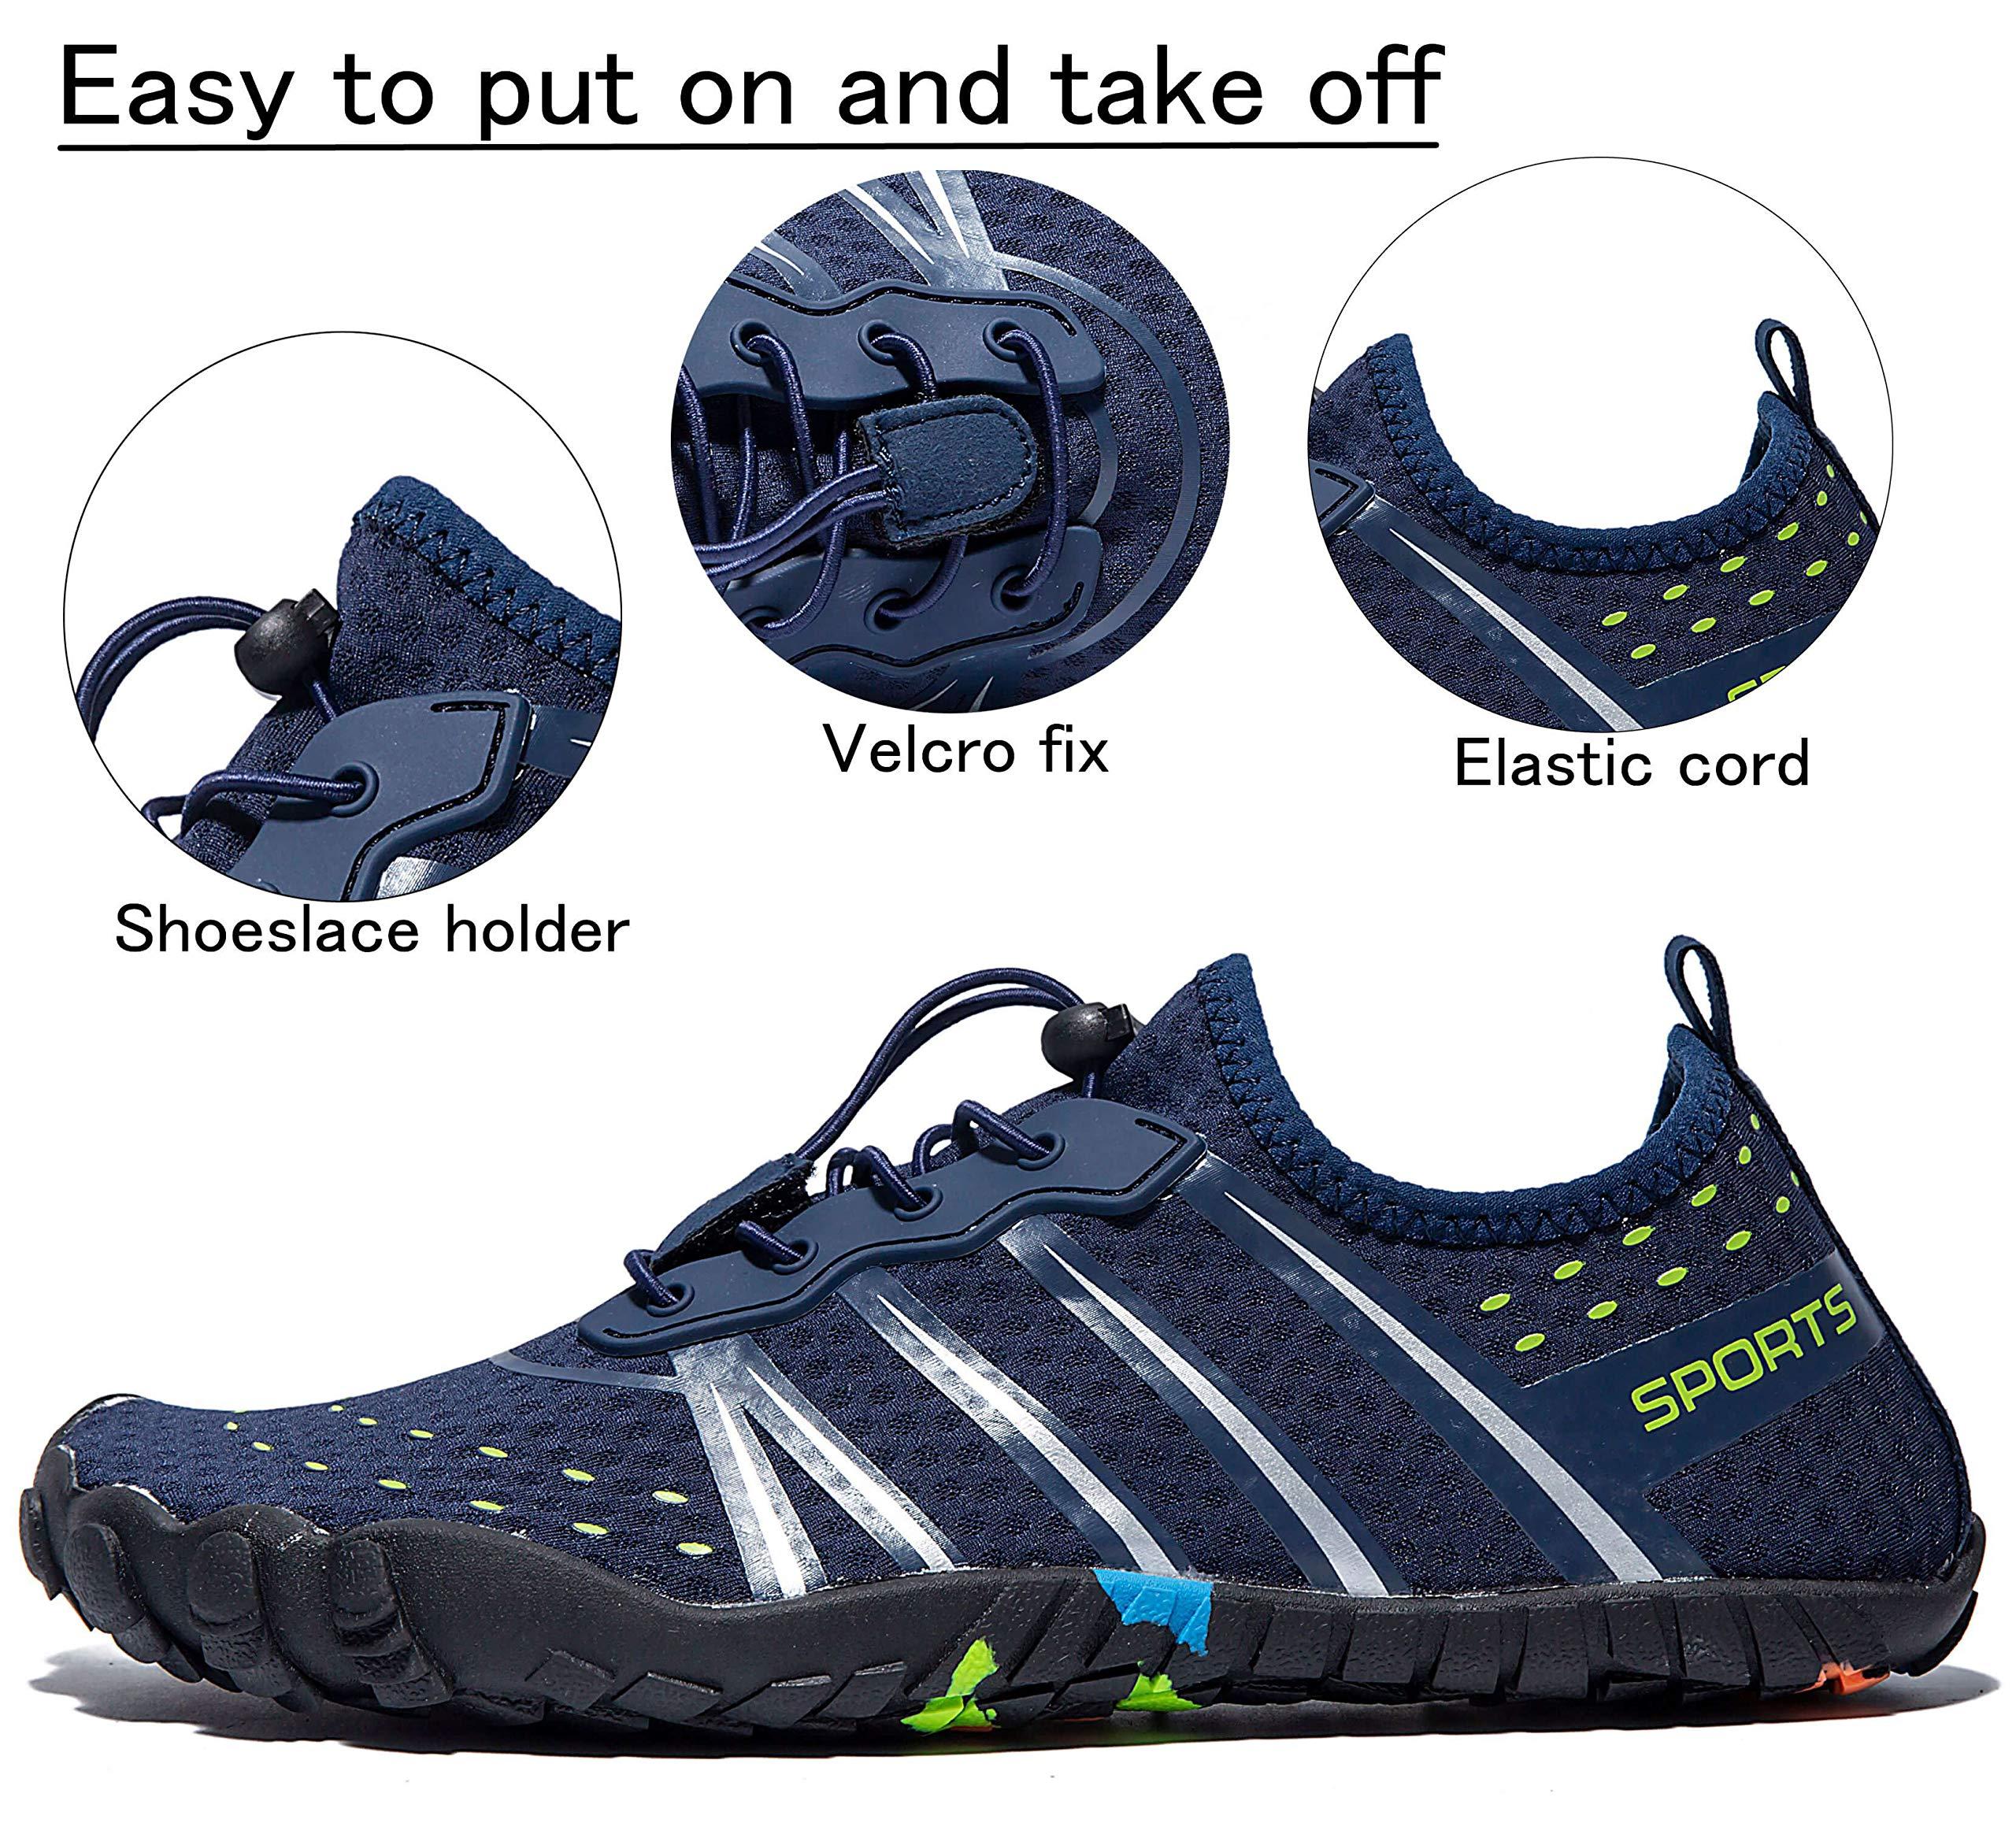 LINGTOM Mens Womens Aqua Water Shoes Quick Dry Barefoot Sports Exercise for Walking Swimming Diving Beach Surf Pool Yoga,Dark Blue 12.5 M US Women / 11 M US Men by LINGTOM (Image #5)